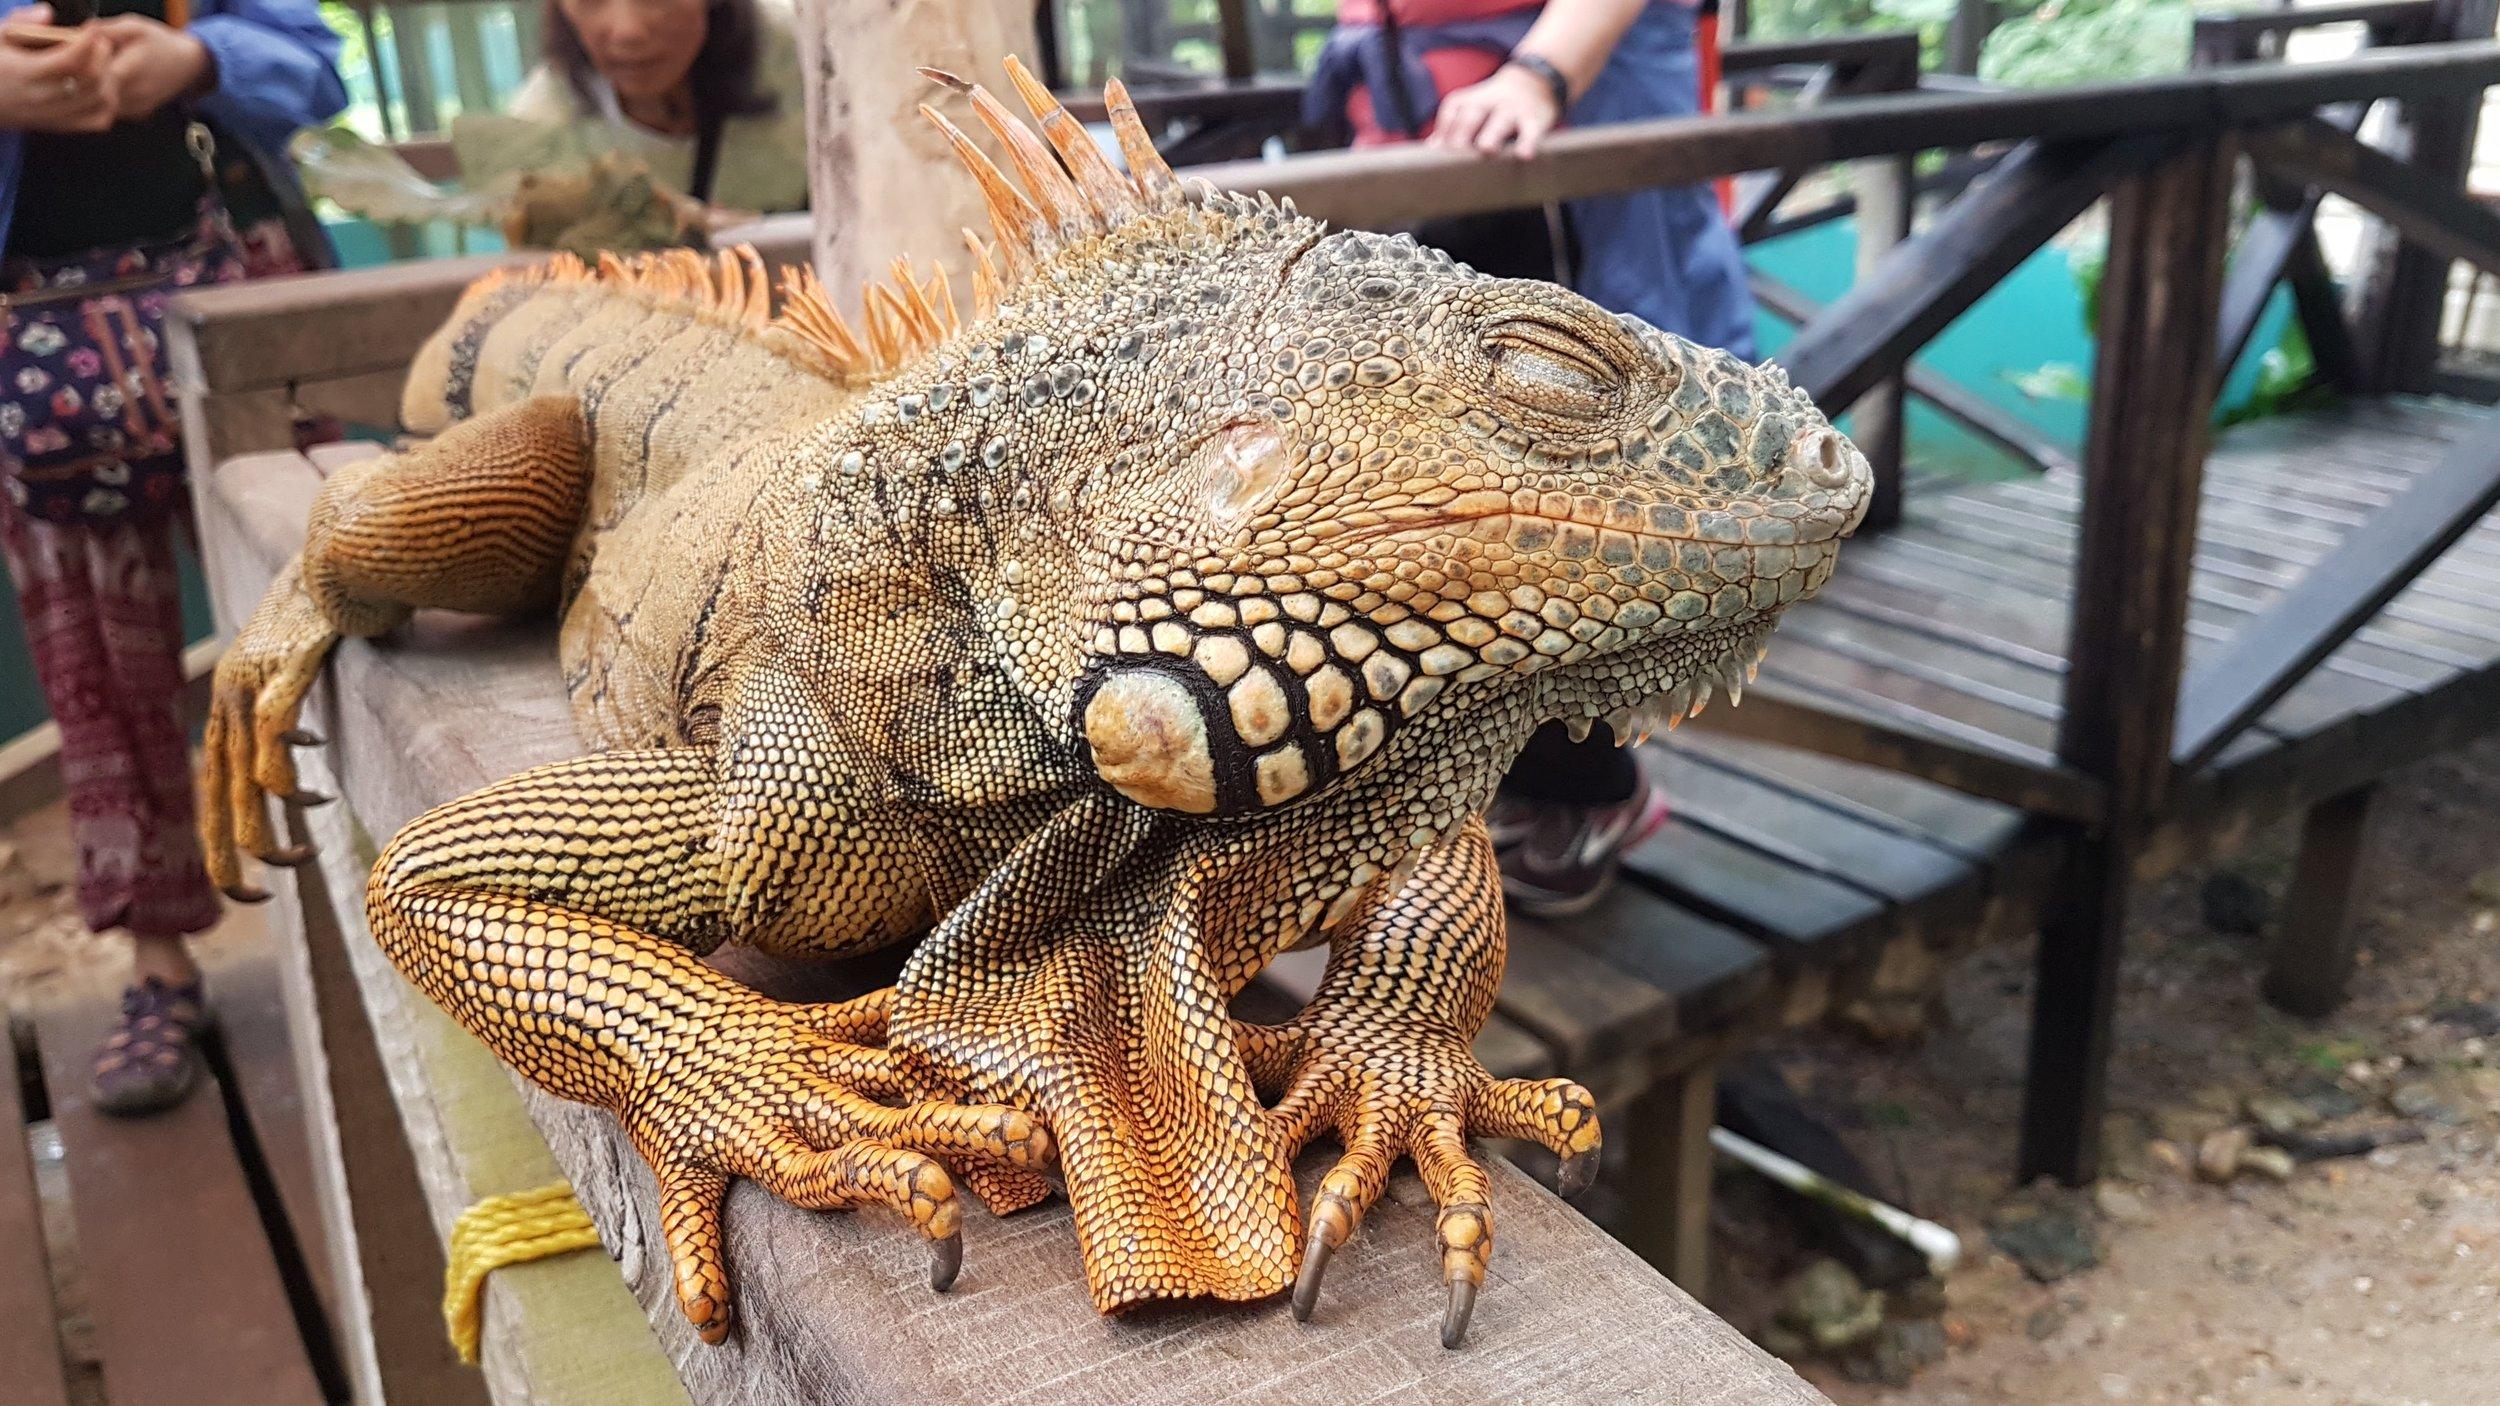 Travel to Belize - San Ignacio Green Iguana